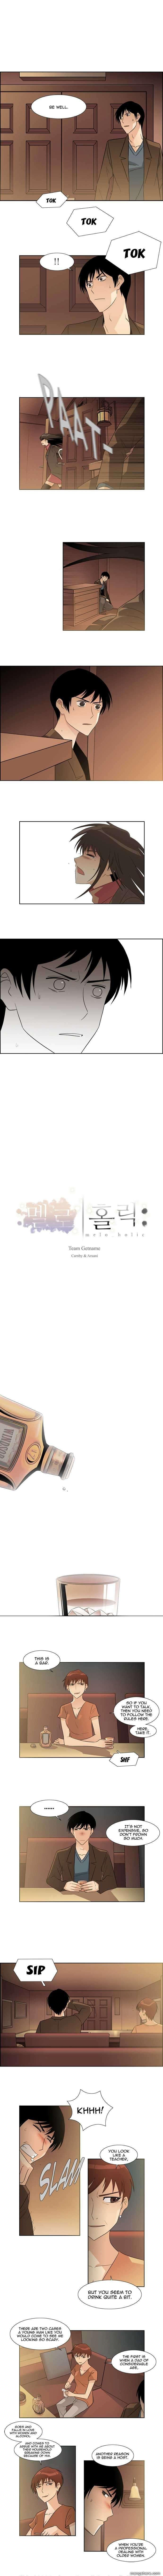 Melo Holic 48 Page 1